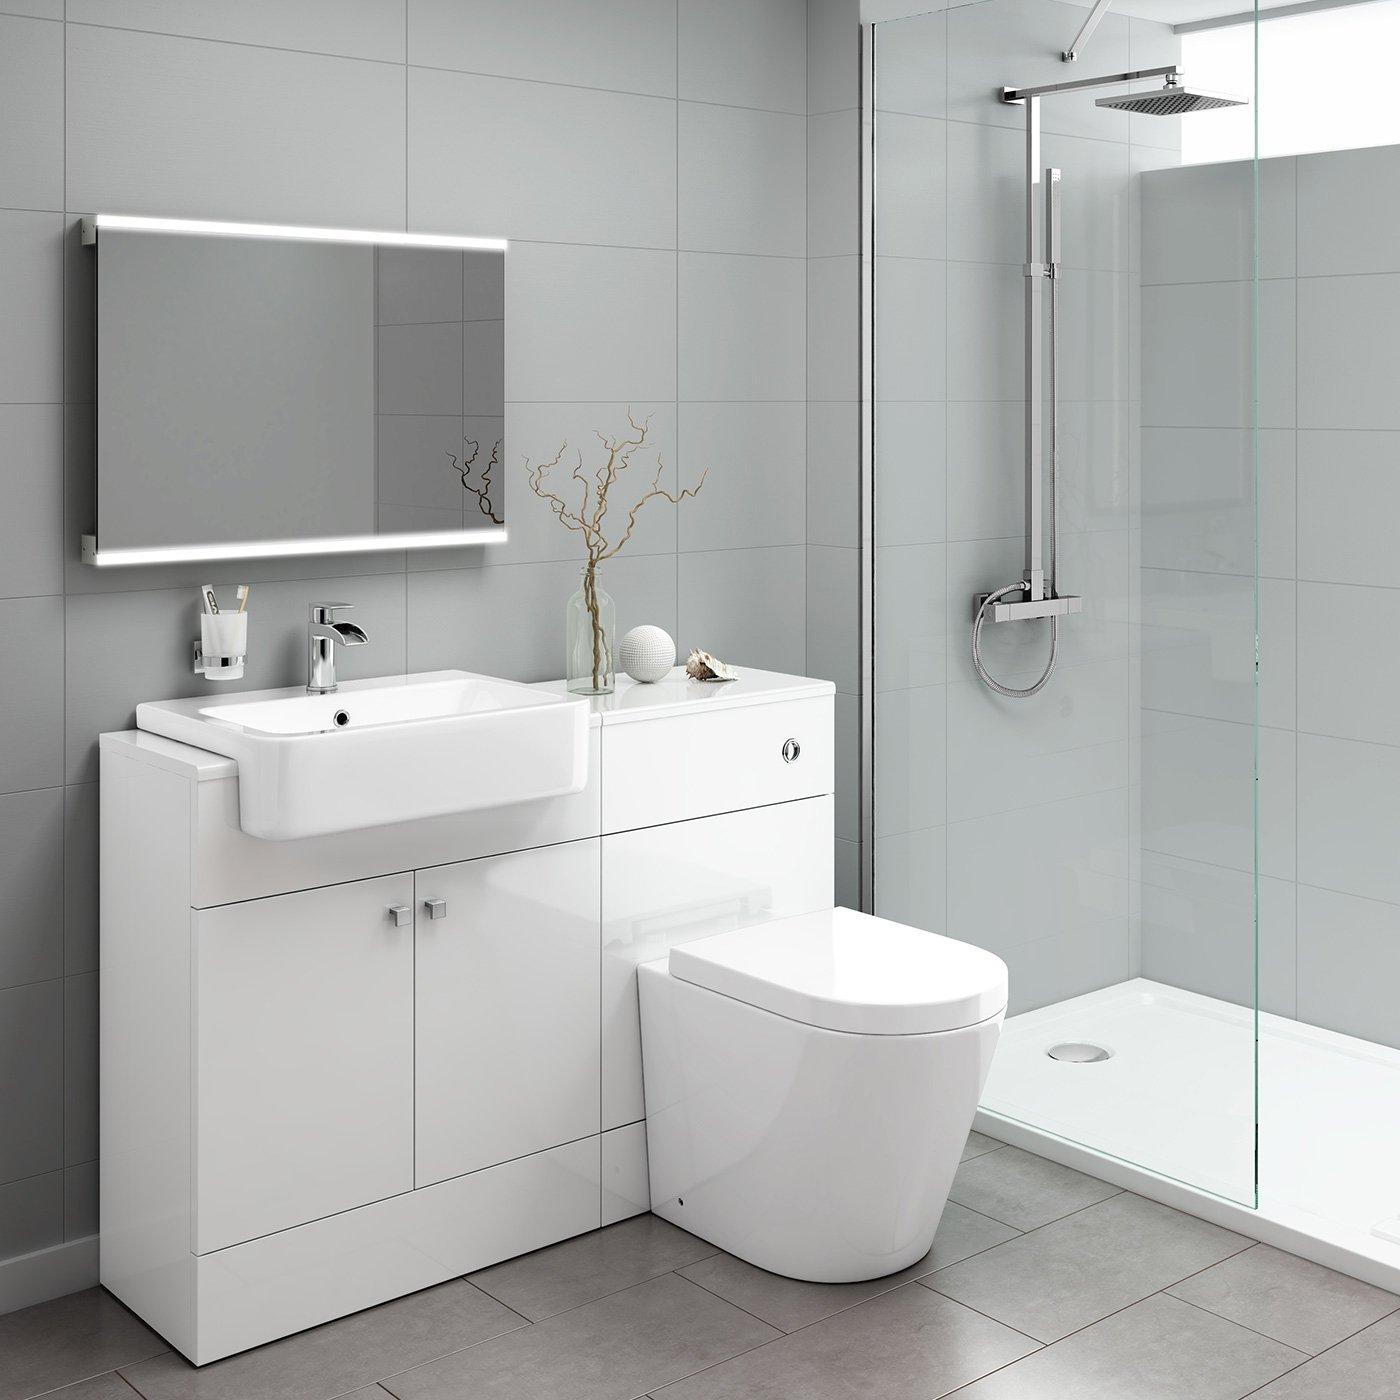 500 x 700 mm Modern Illuminated LED Bathroom Mirror with Bluetooth ...